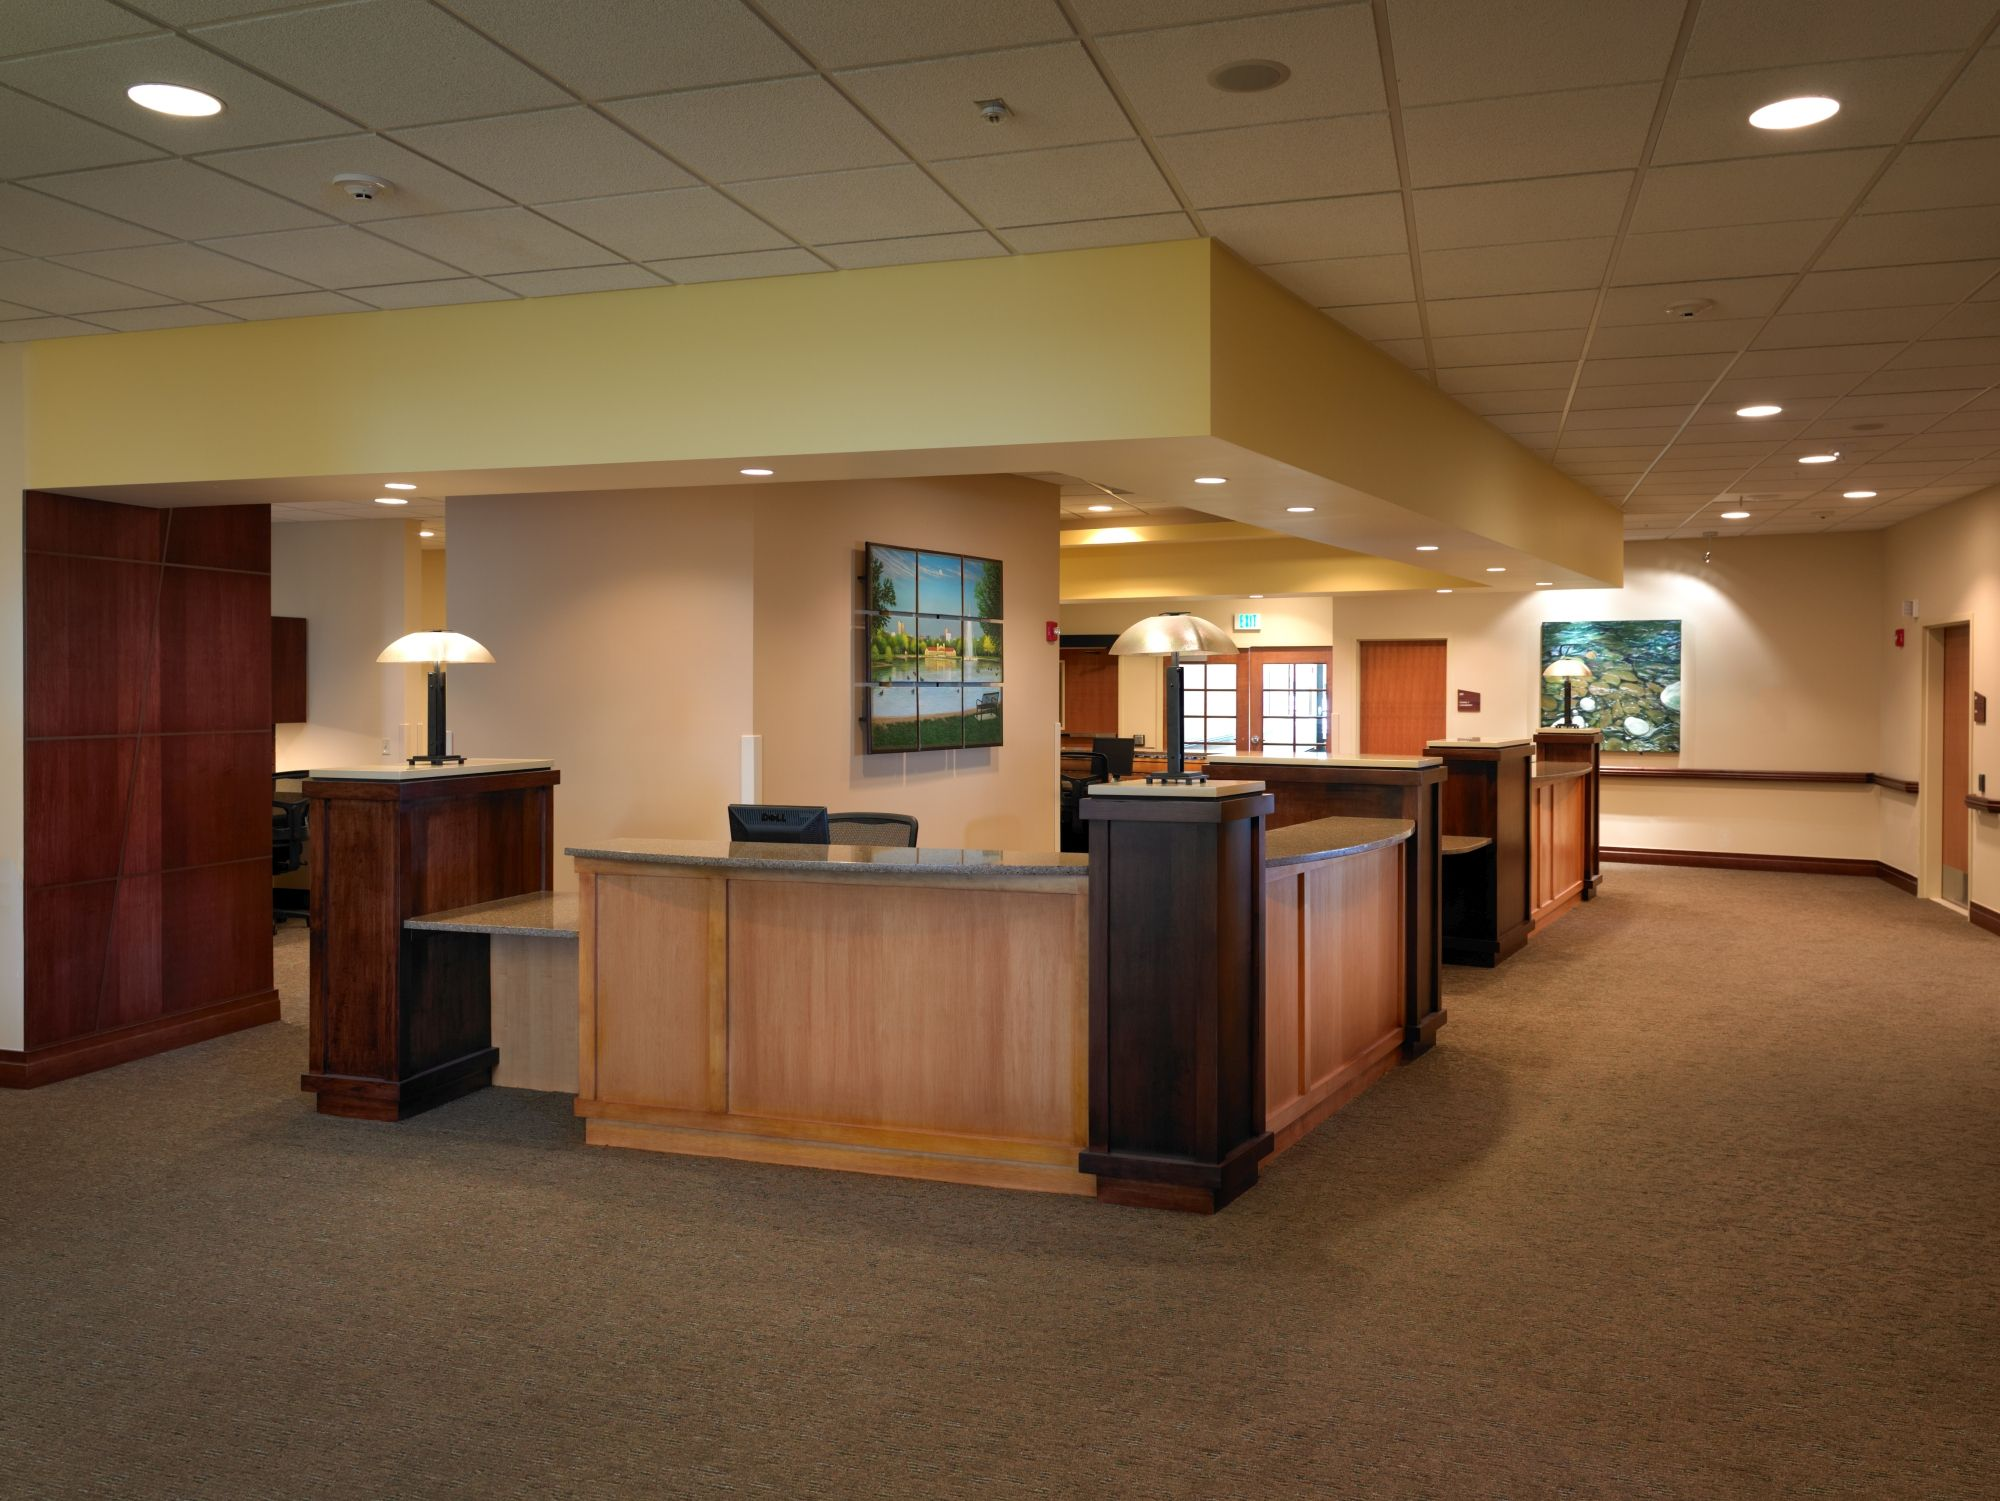 Denver Hospice Nurse Station.jpg